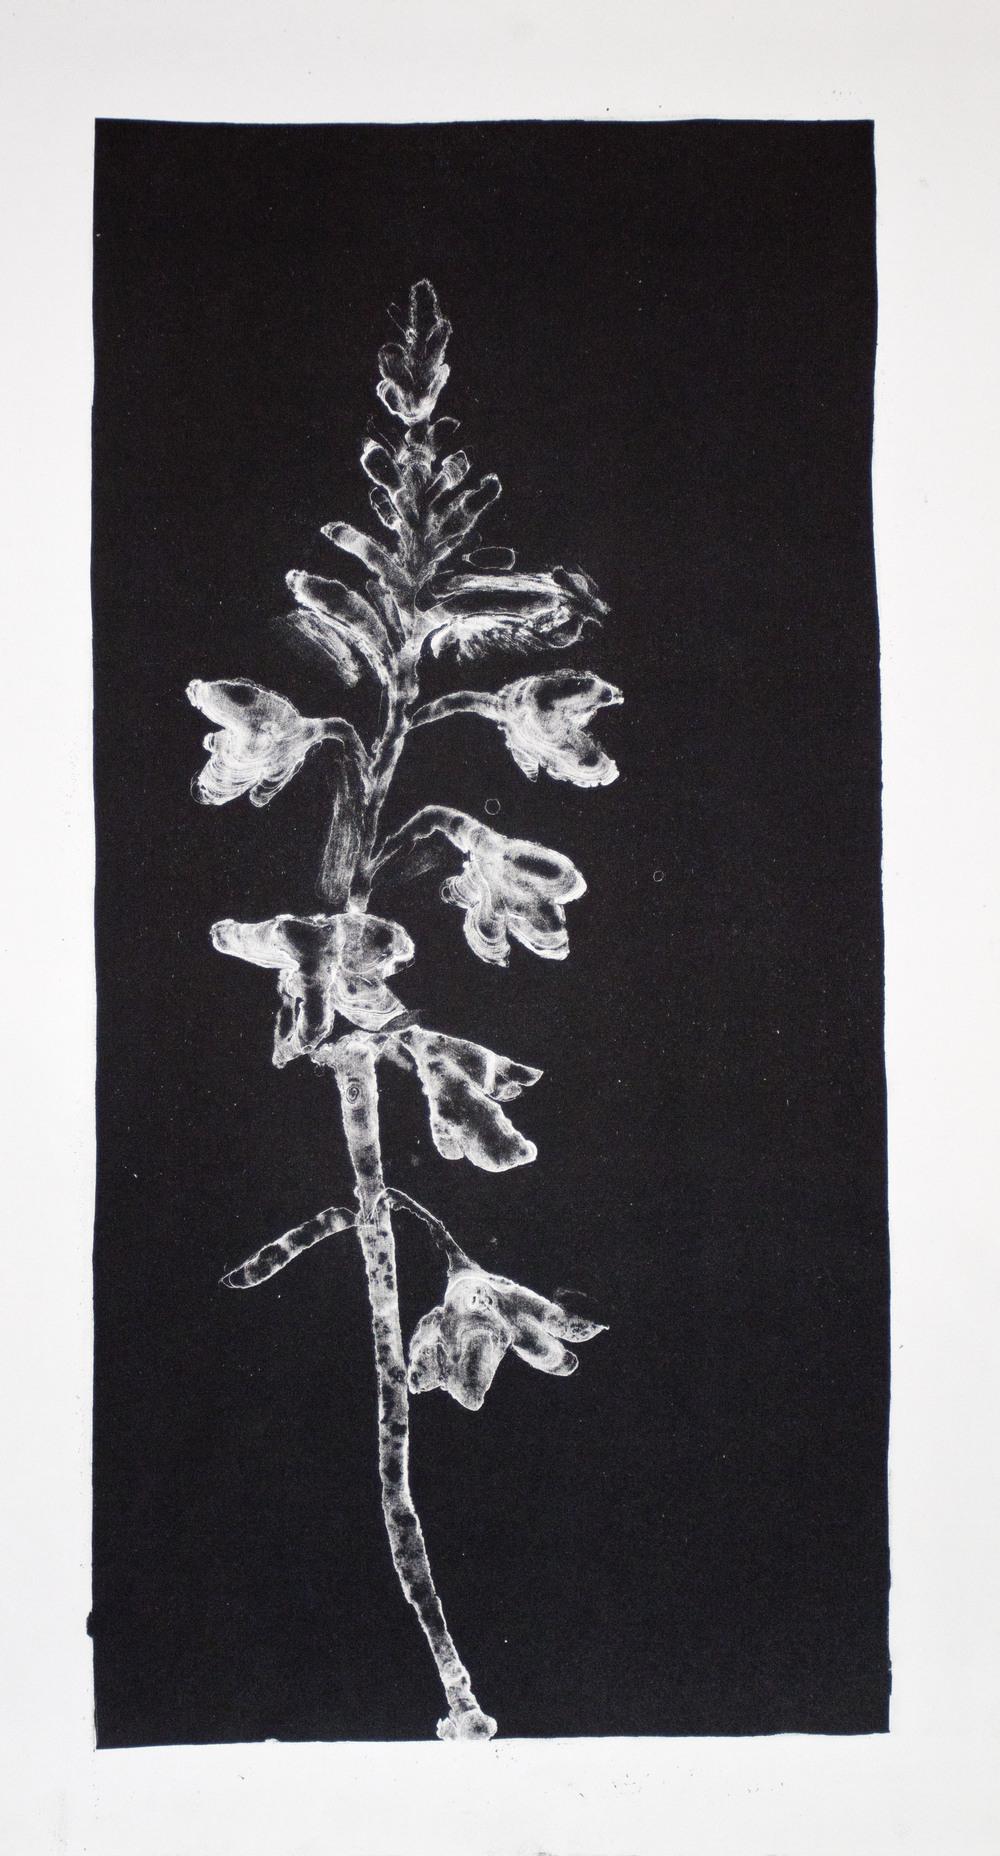 Iridaceae - Watsonia   Lithograph. 2016  48 x 26cm  $600 (F)  $400 (UF)